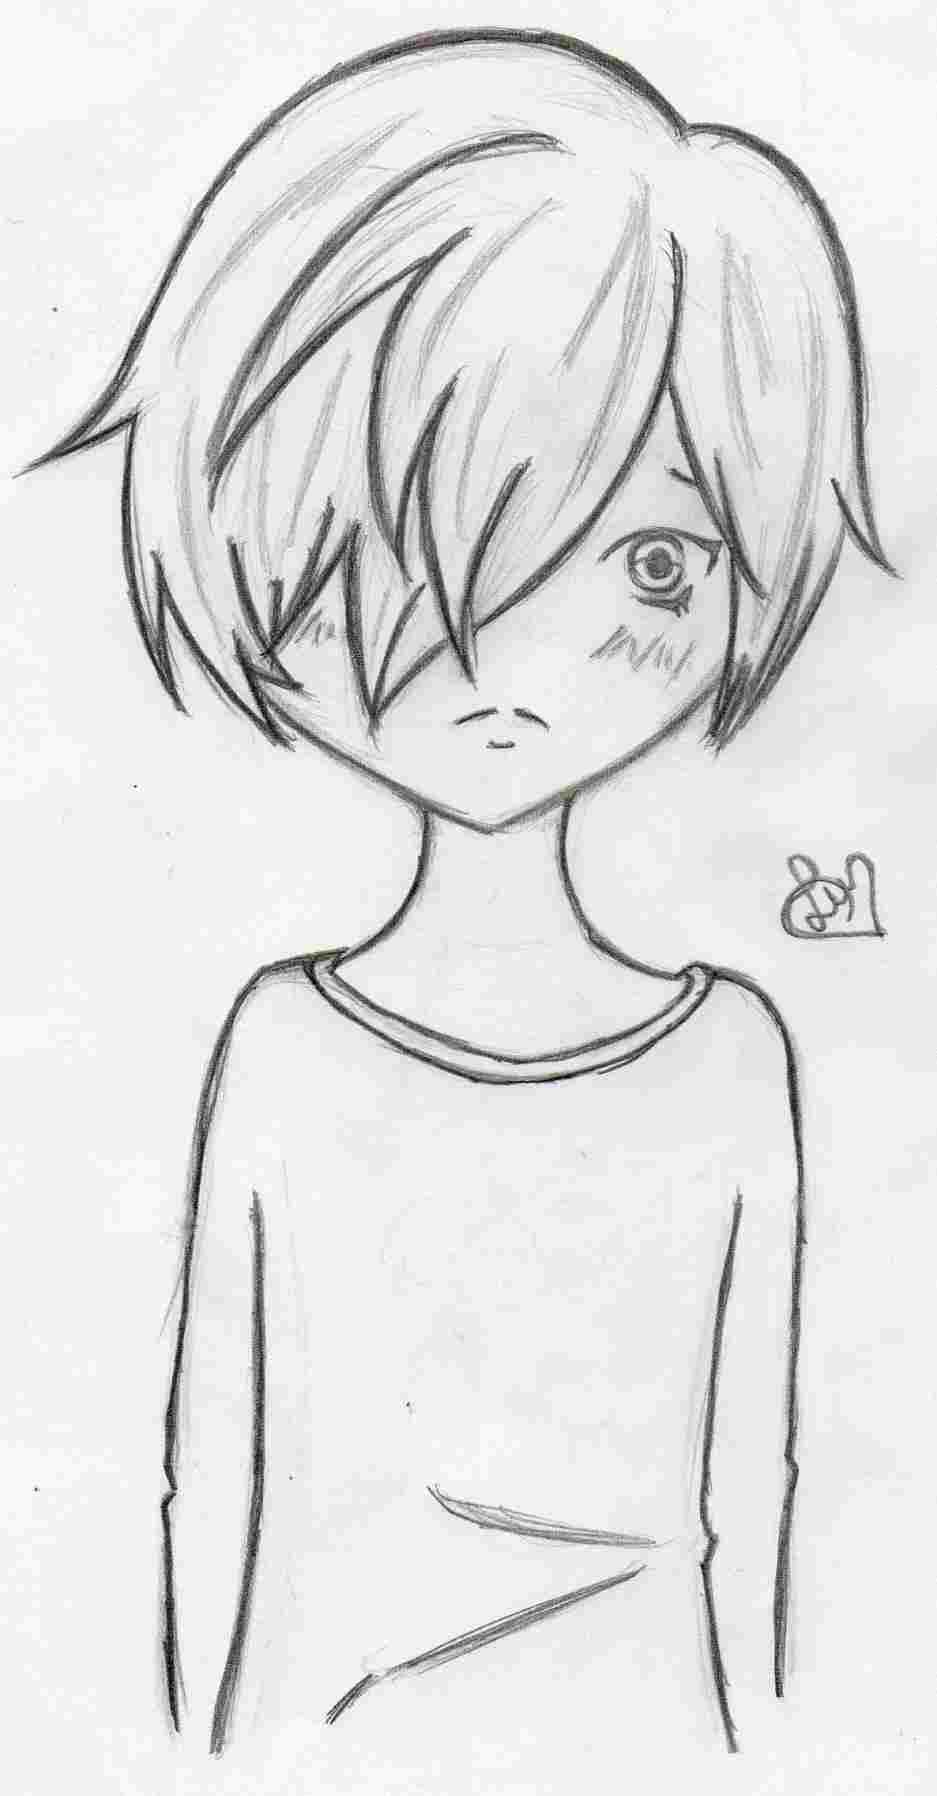 U Couple Wallpapersrhpinterestcom Cute Pencil Sketches - Boy Easy Anime Drawings , HD Wallpaper & Backgrounds